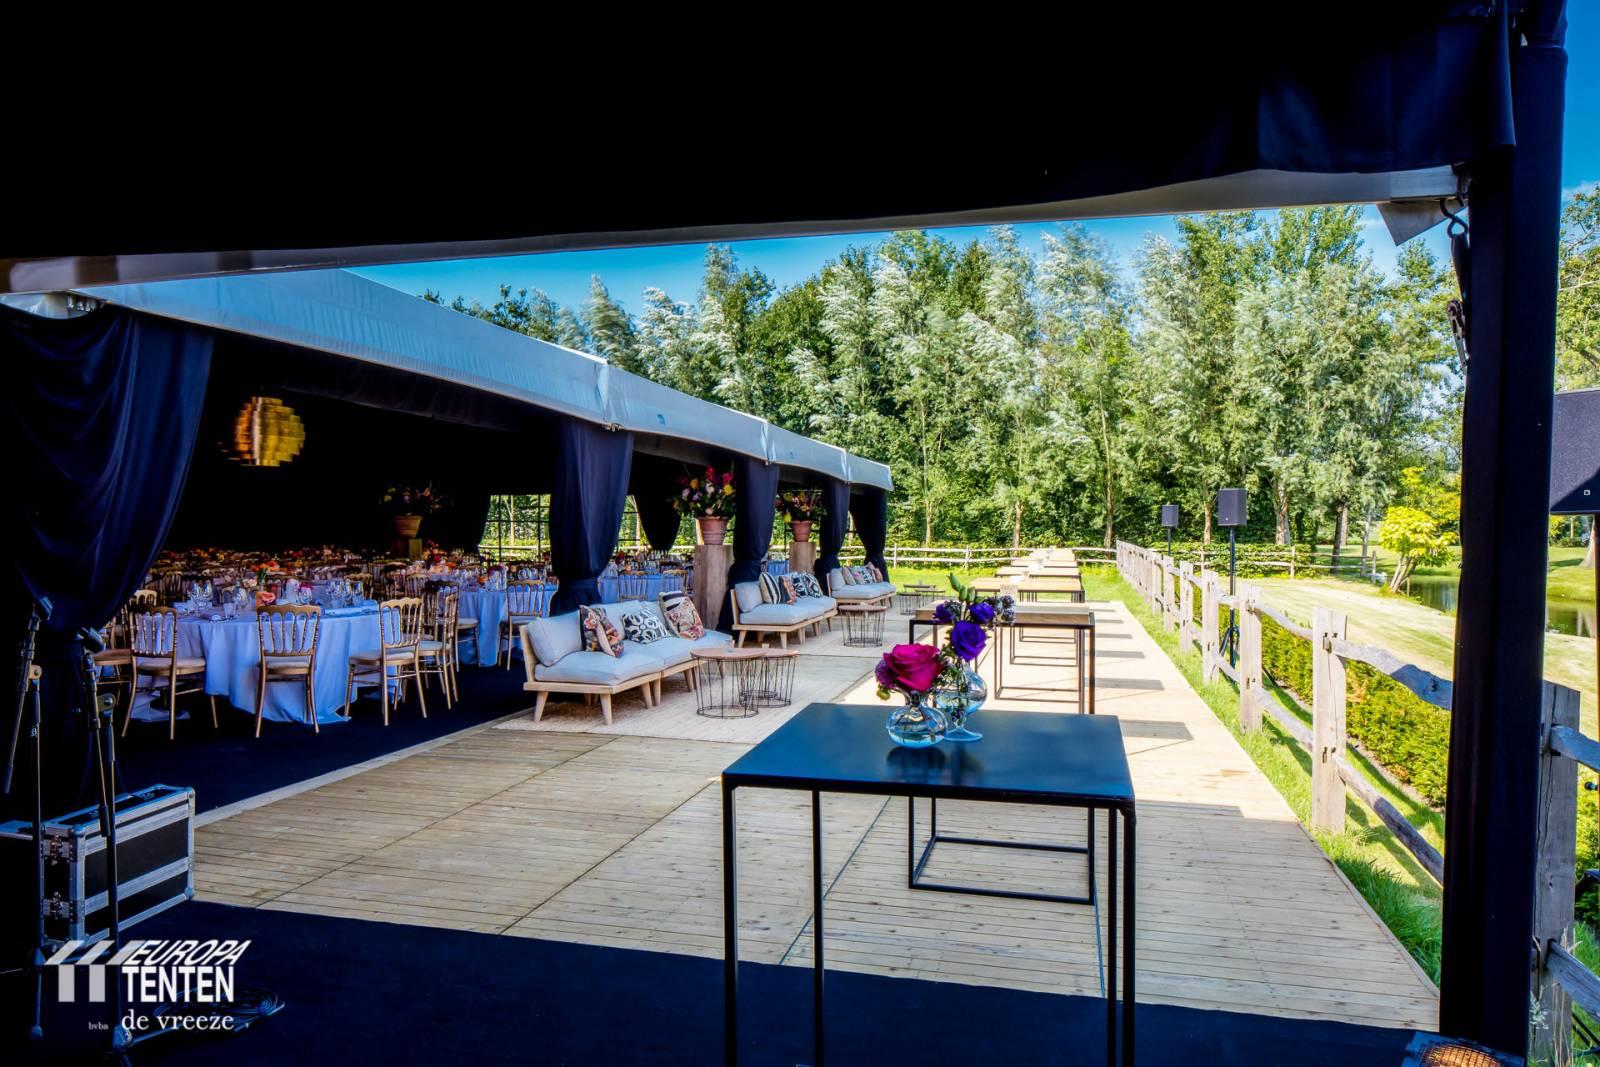 Europatenten 2 - House of Weddings-18